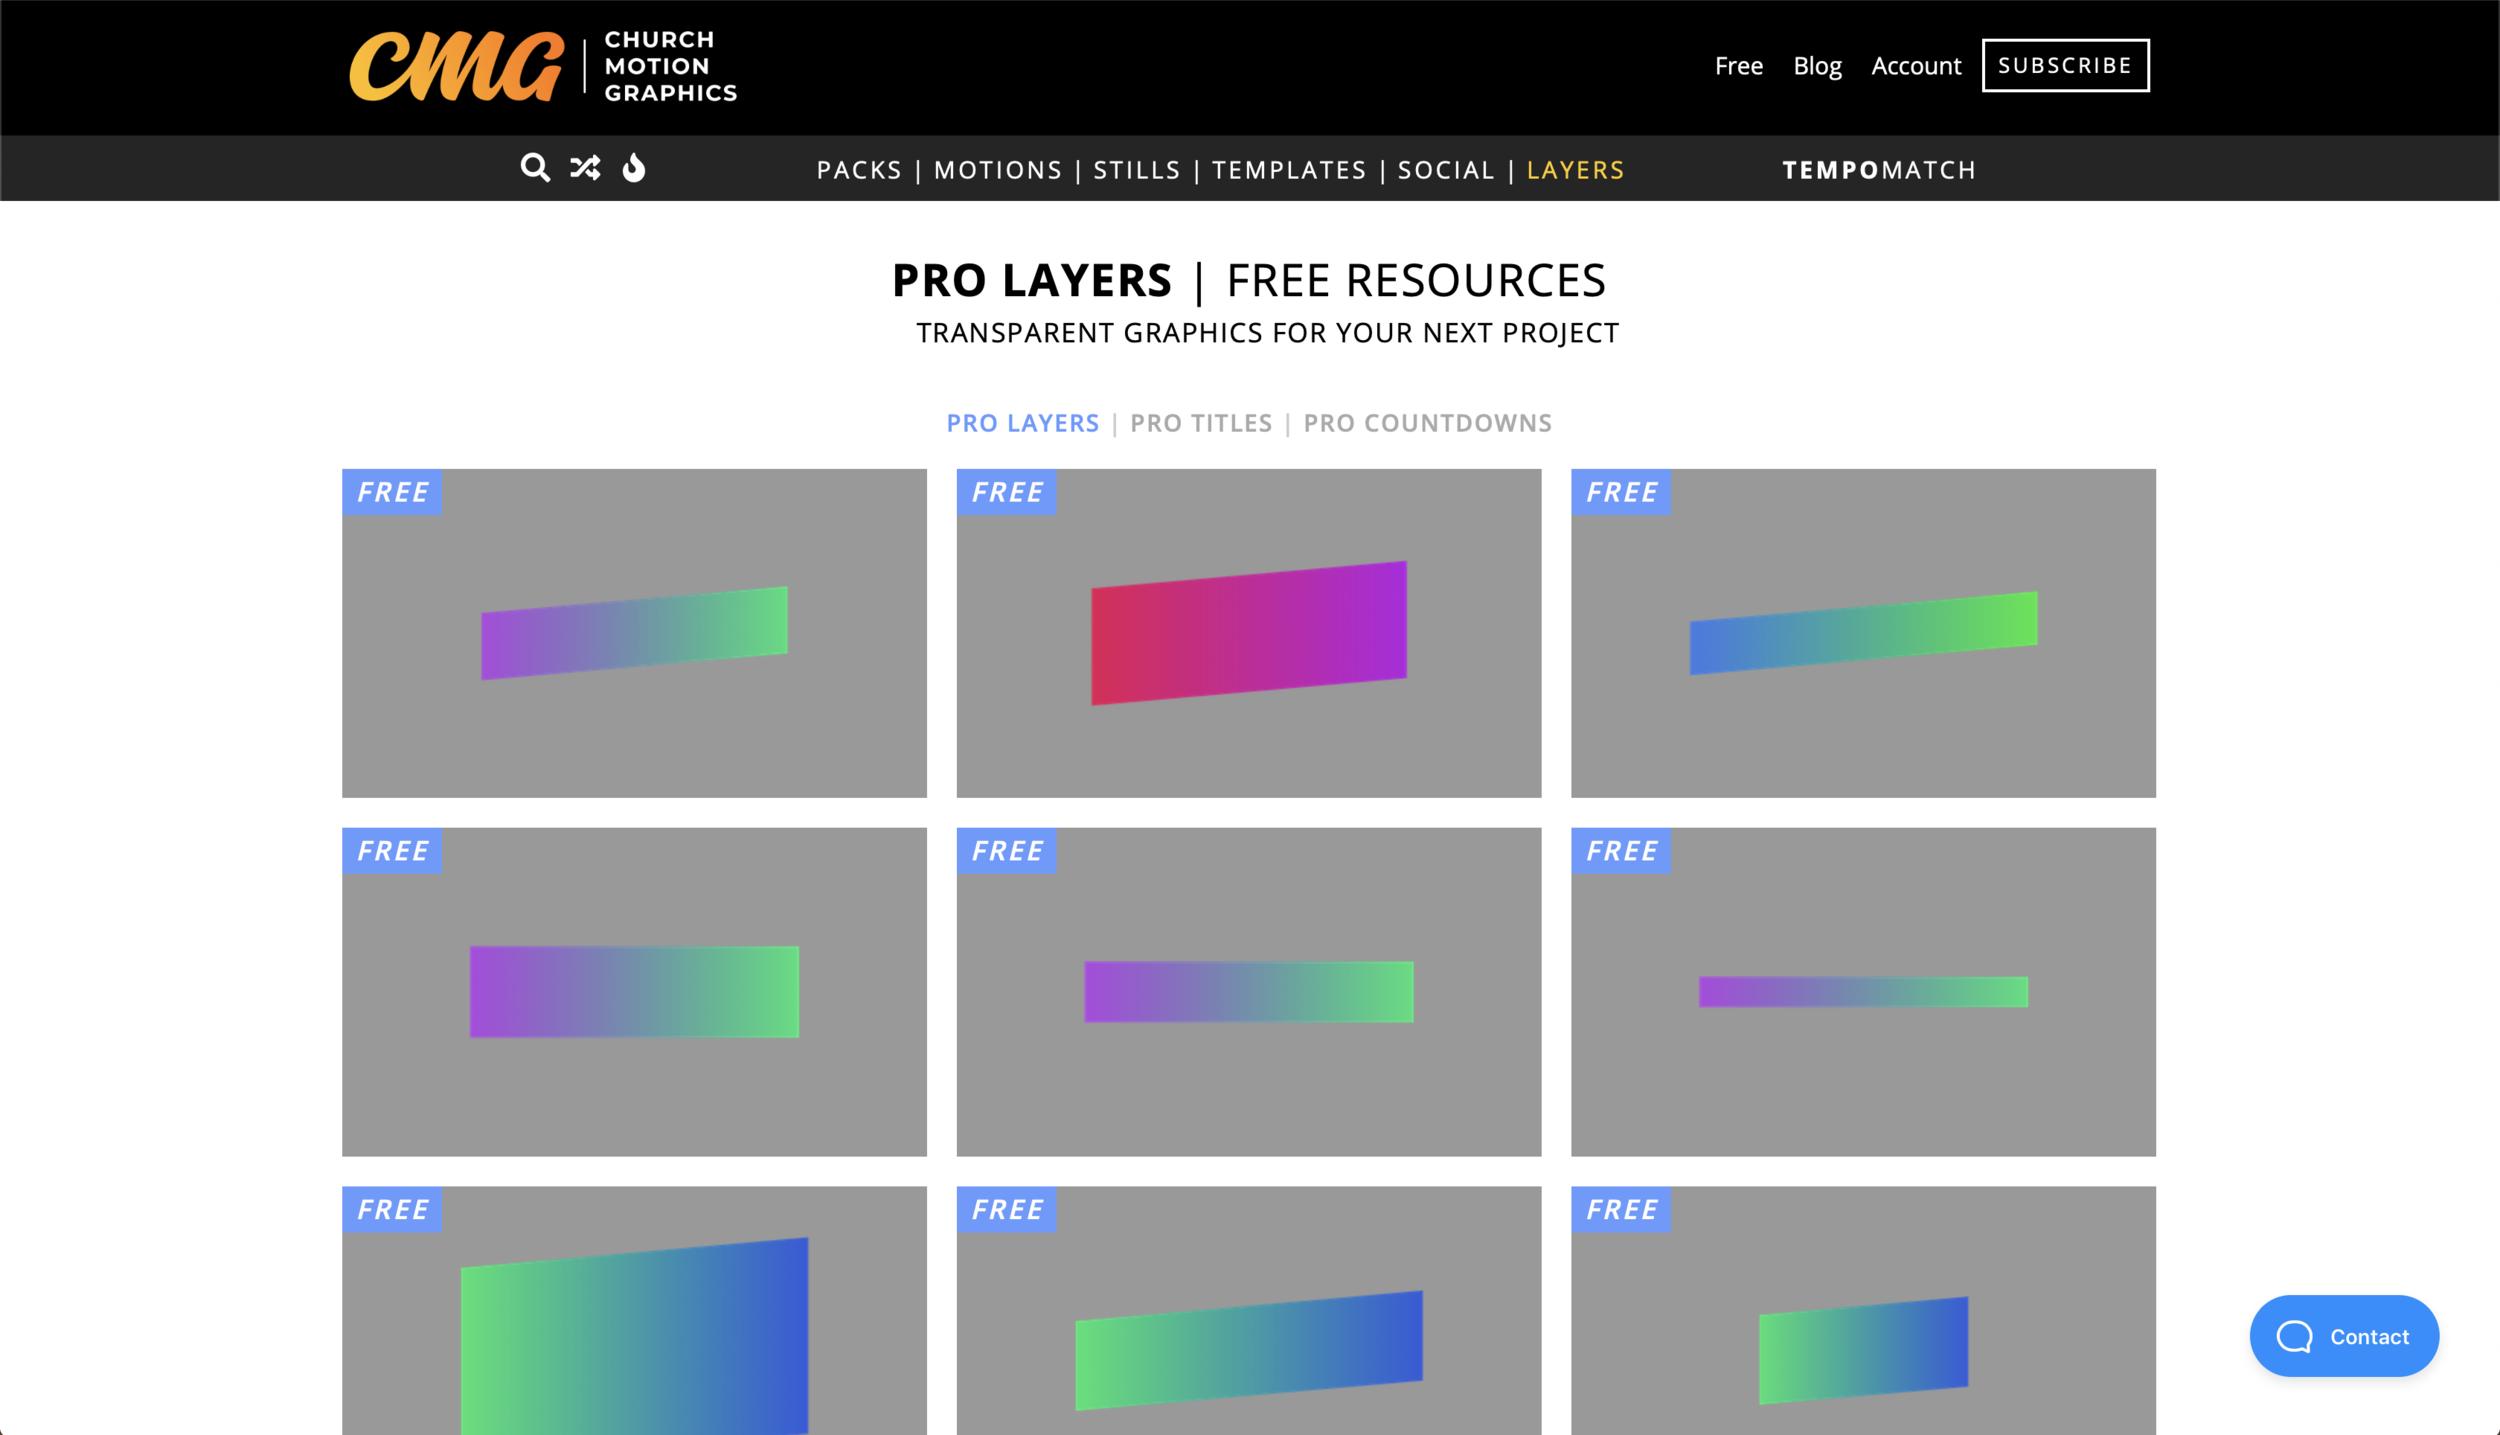 Church Motion Graphics - Shop — CREATIVE HUB